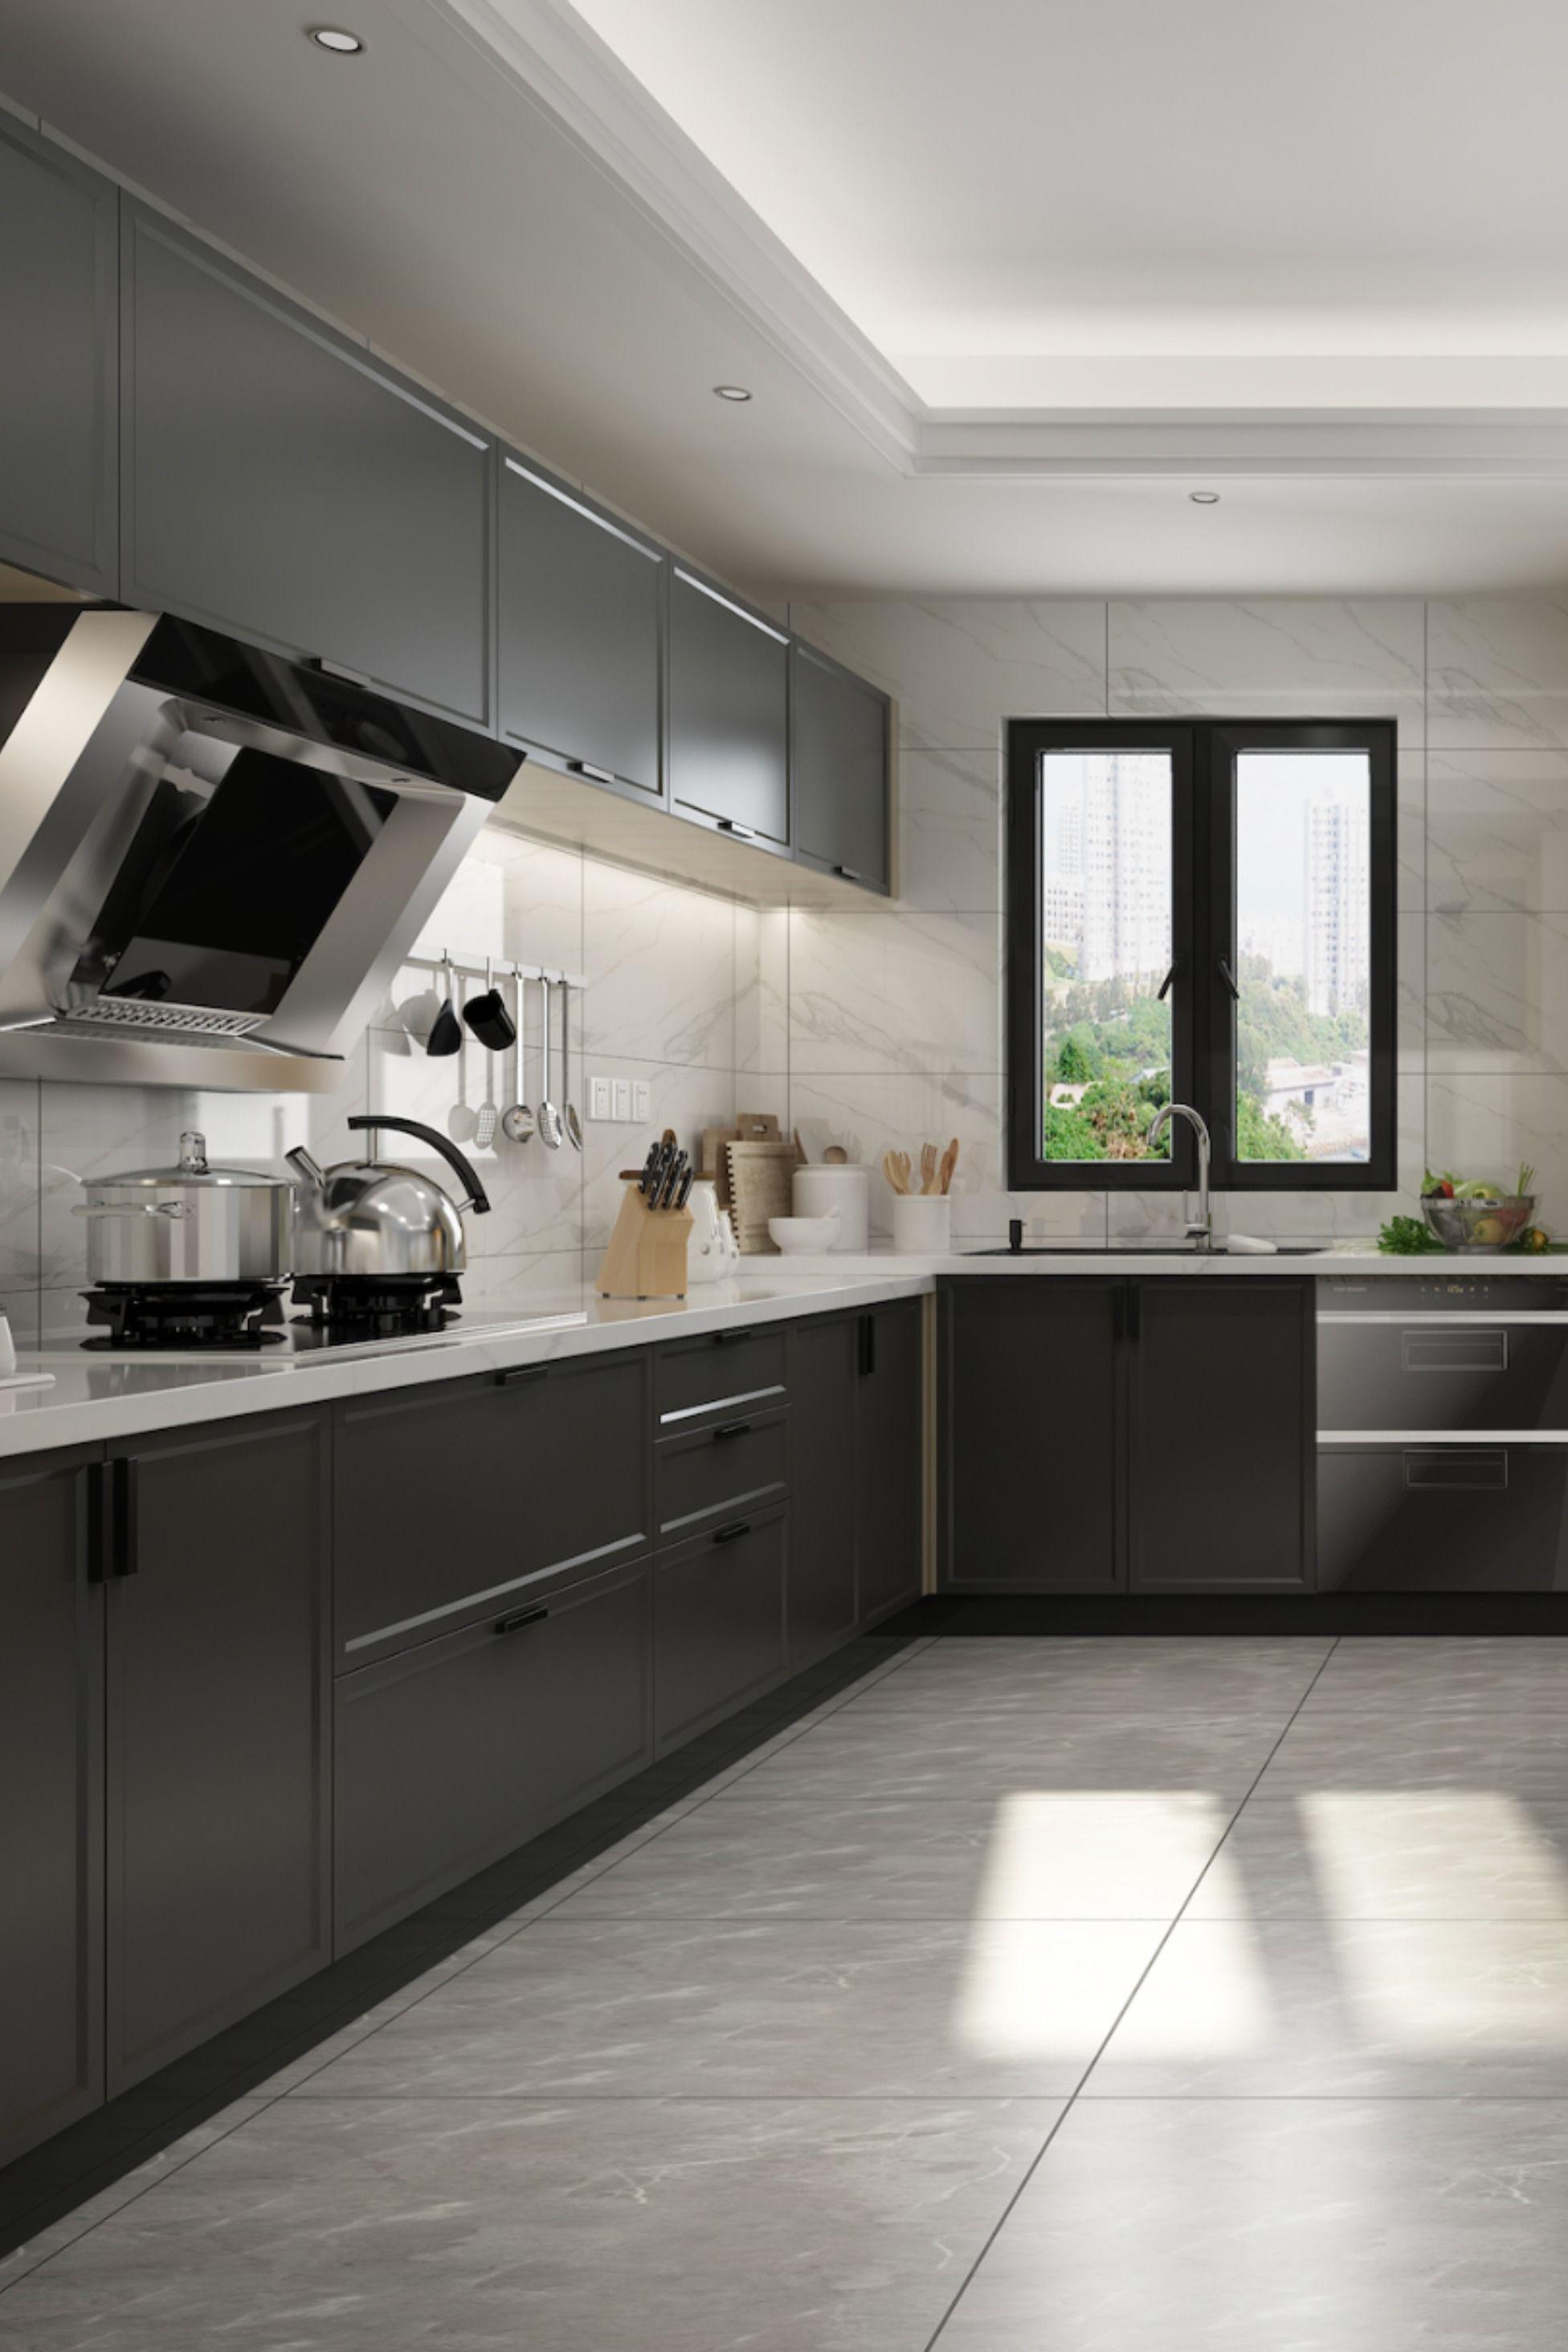 Pvc Blister Kitchen Cabinet Kitchen Cabinets Kitchen Cabinets For Sale Custom Kitchen Cabinets